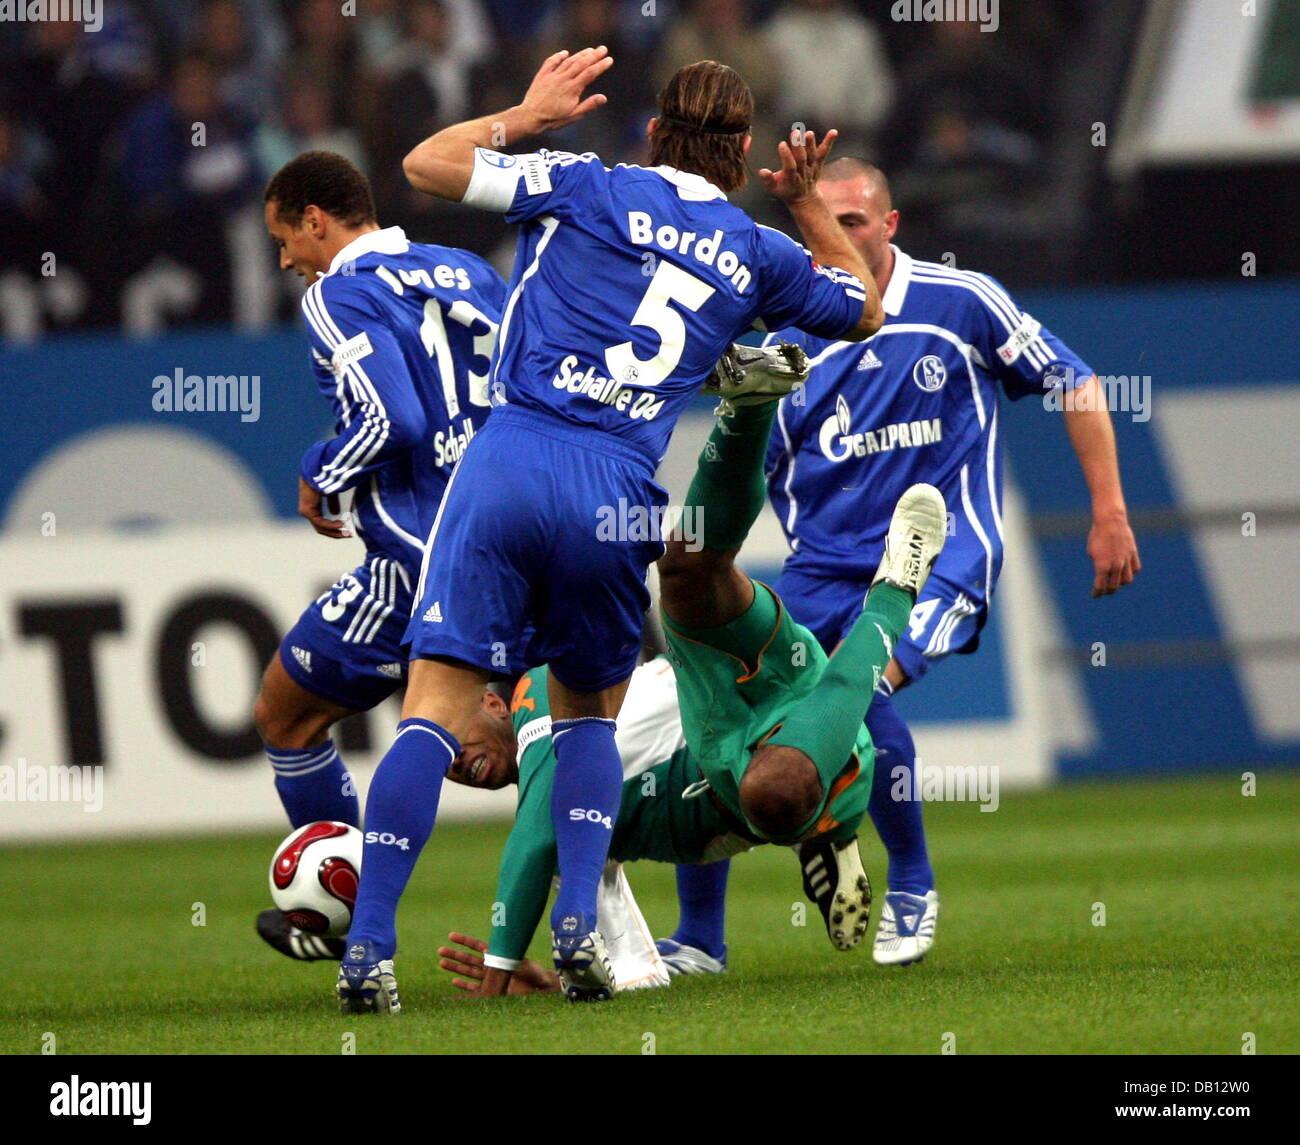 (L-R) Schalke?s Jermaine Jone, Macelo Bordon and Christian Pander unite to stop Bremen?s Neldo (middle) during the - Stock Image